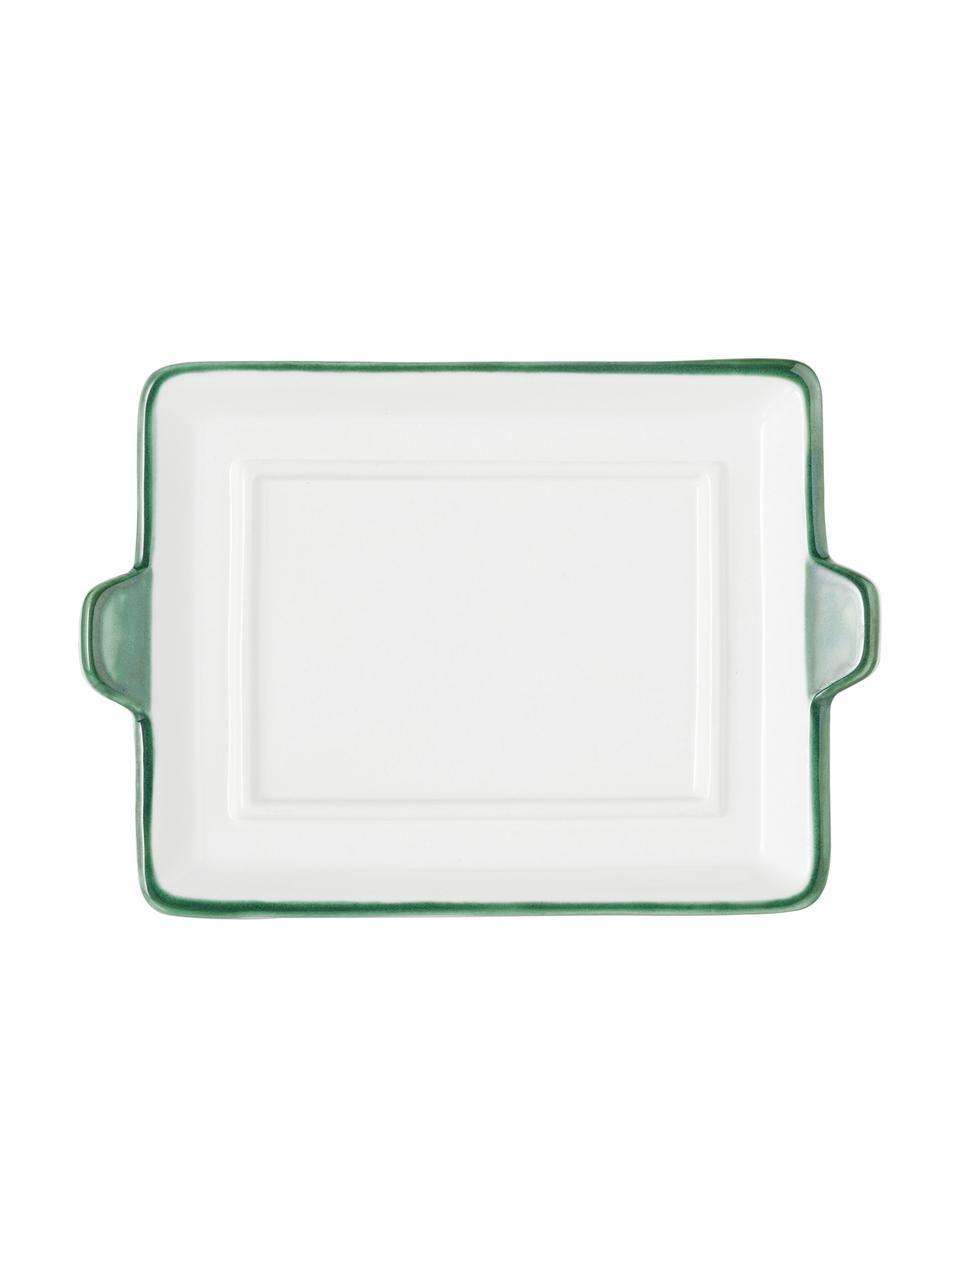 Burriera in ceramica dipinta a mano  Grüner Hirsch, Ceramica, Verde, bianco, Larg. 18 x Alt. 6 x Prof. 10 cm